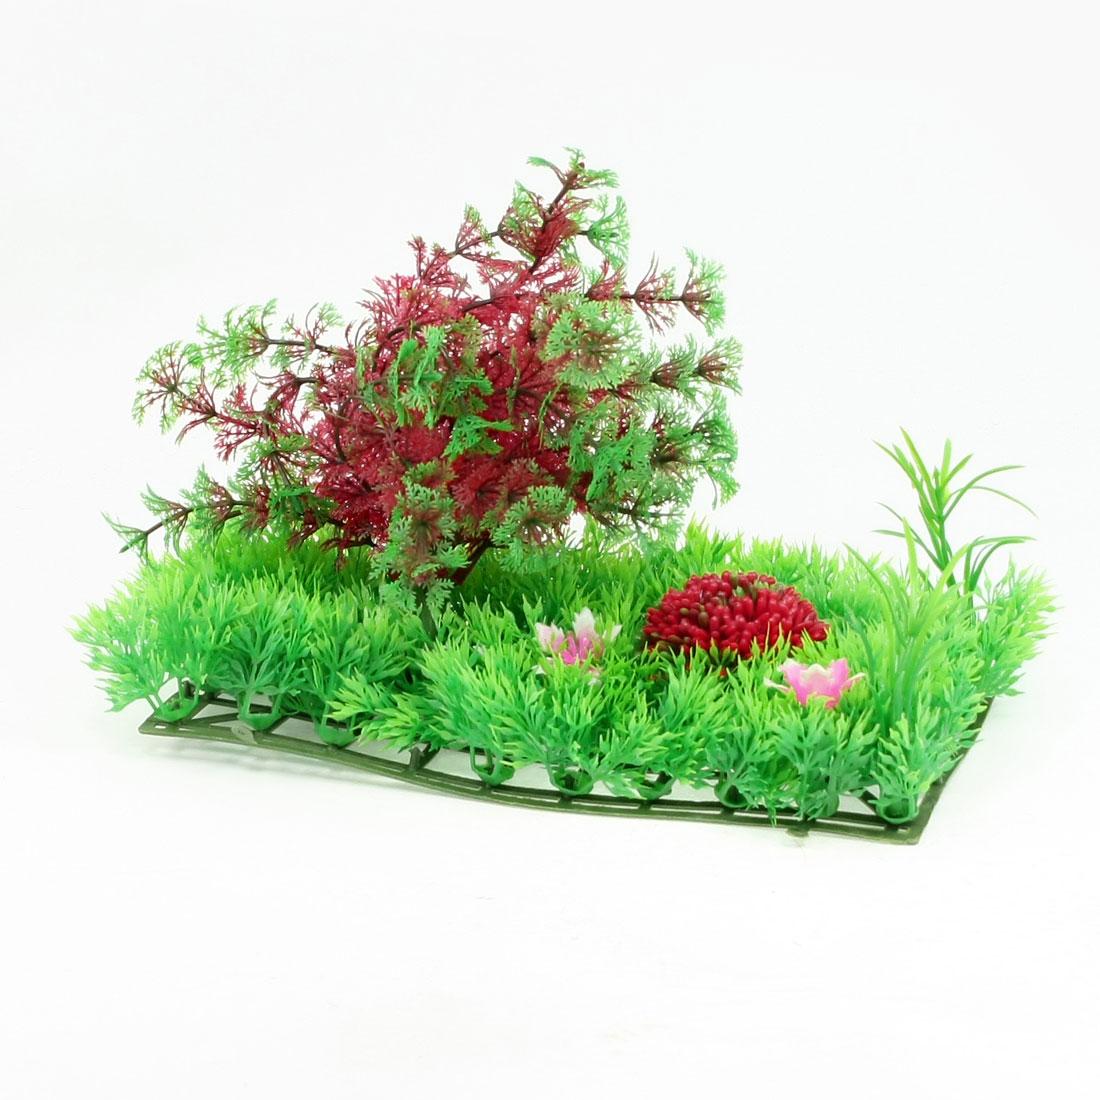 "Fish Tank Plastic Crimson Green Snow Flake Leaf Plants Lawn Decor 9.8"" x 4.5"""